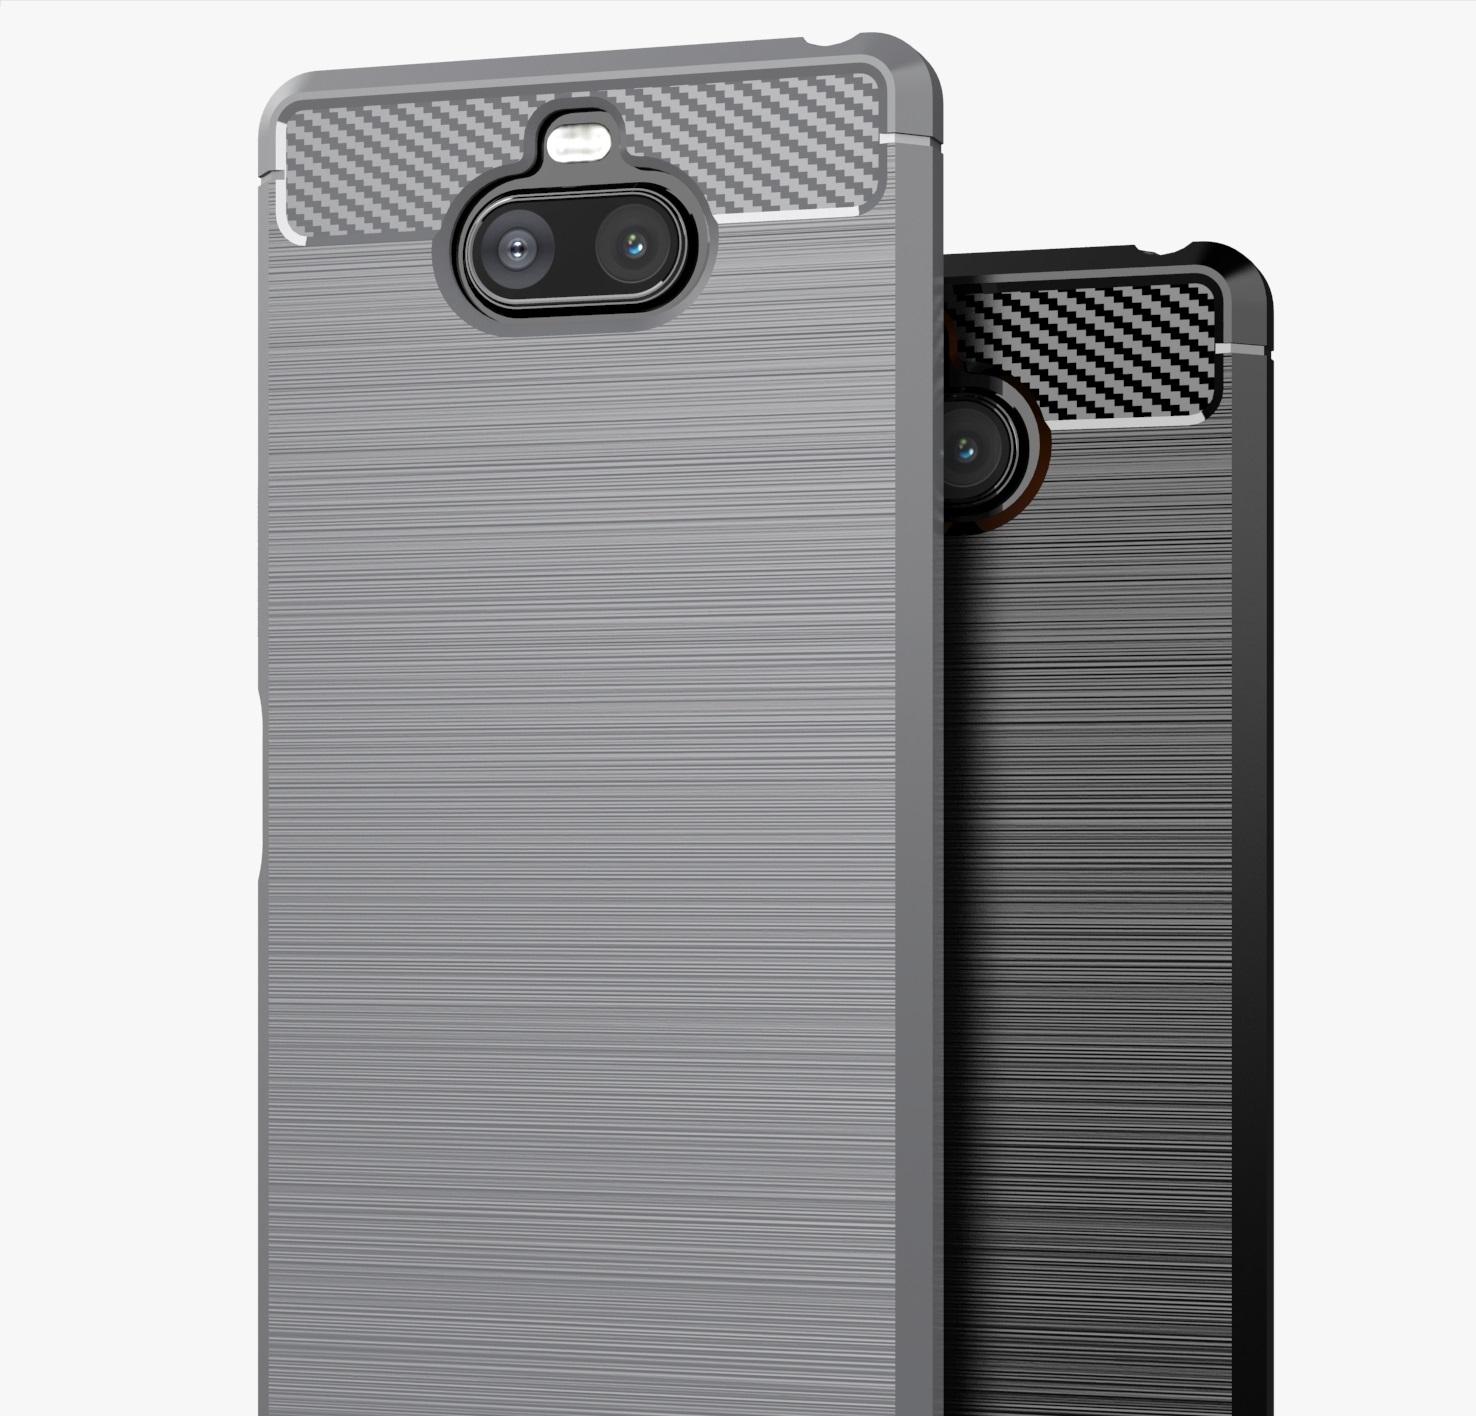 Чехол на Sony Xperia 8 цвет Gray (серый), серия Carbon от Caseport